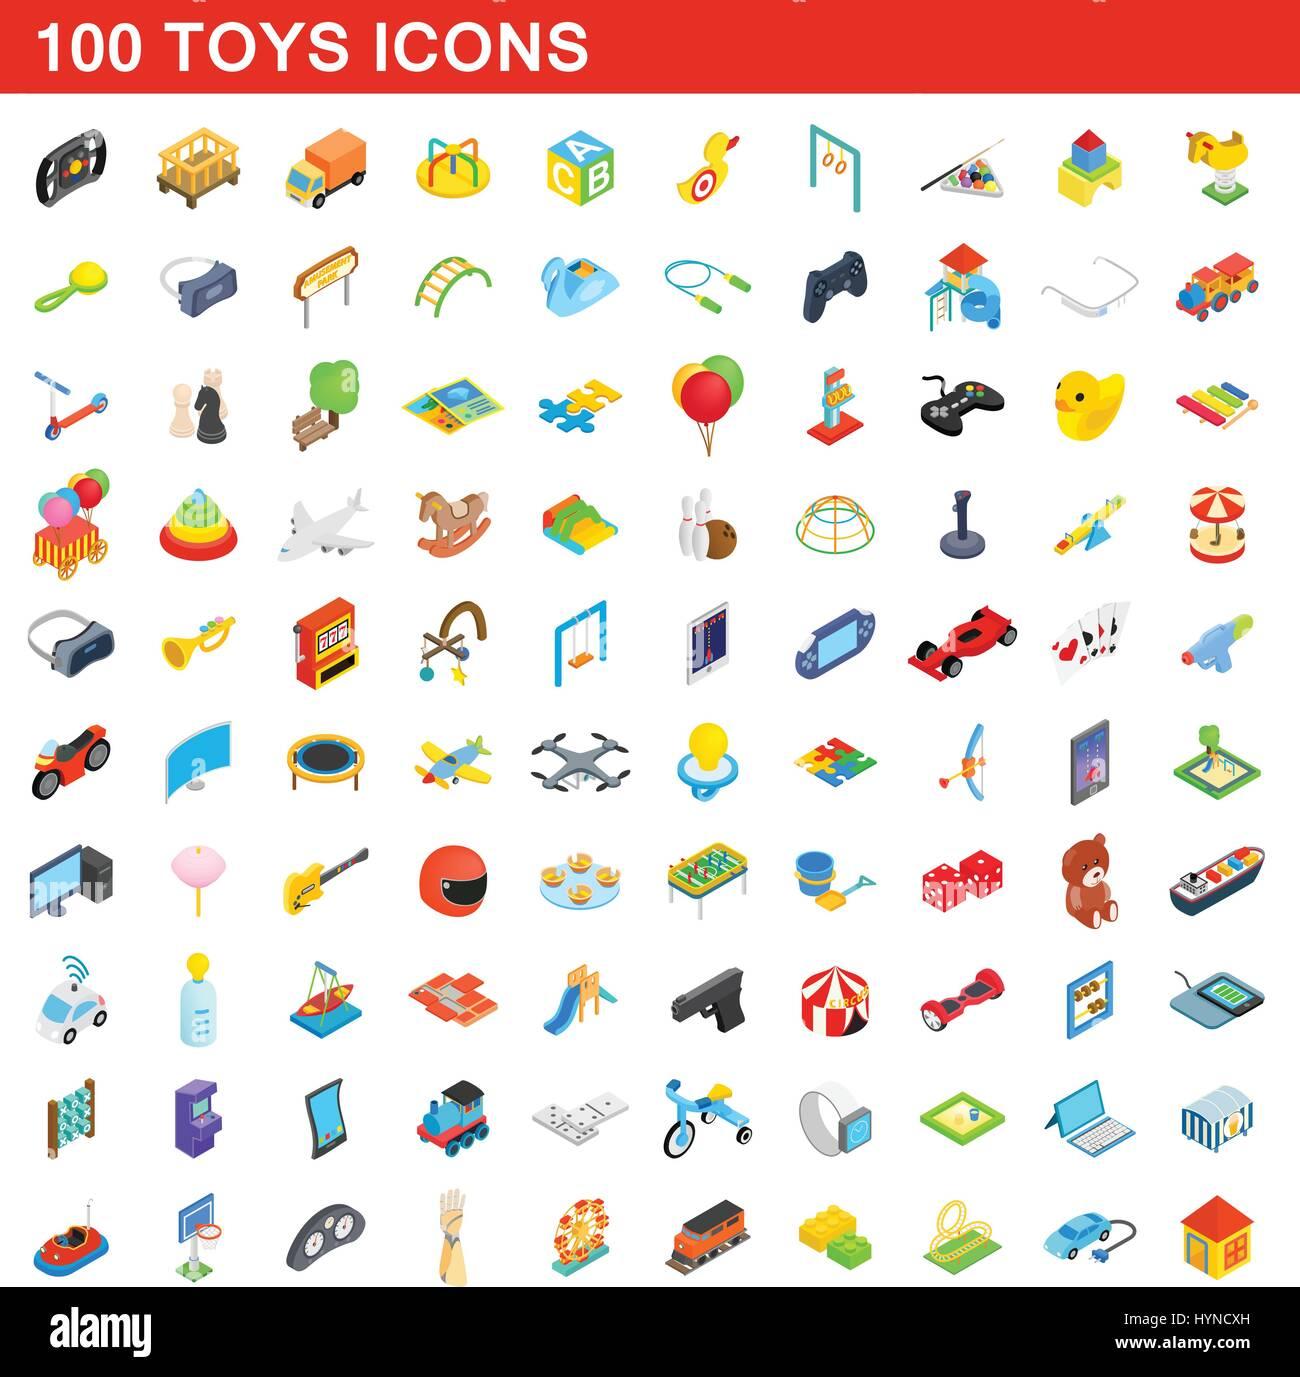 100 toys icons set, isometric 3d style - Stock Image